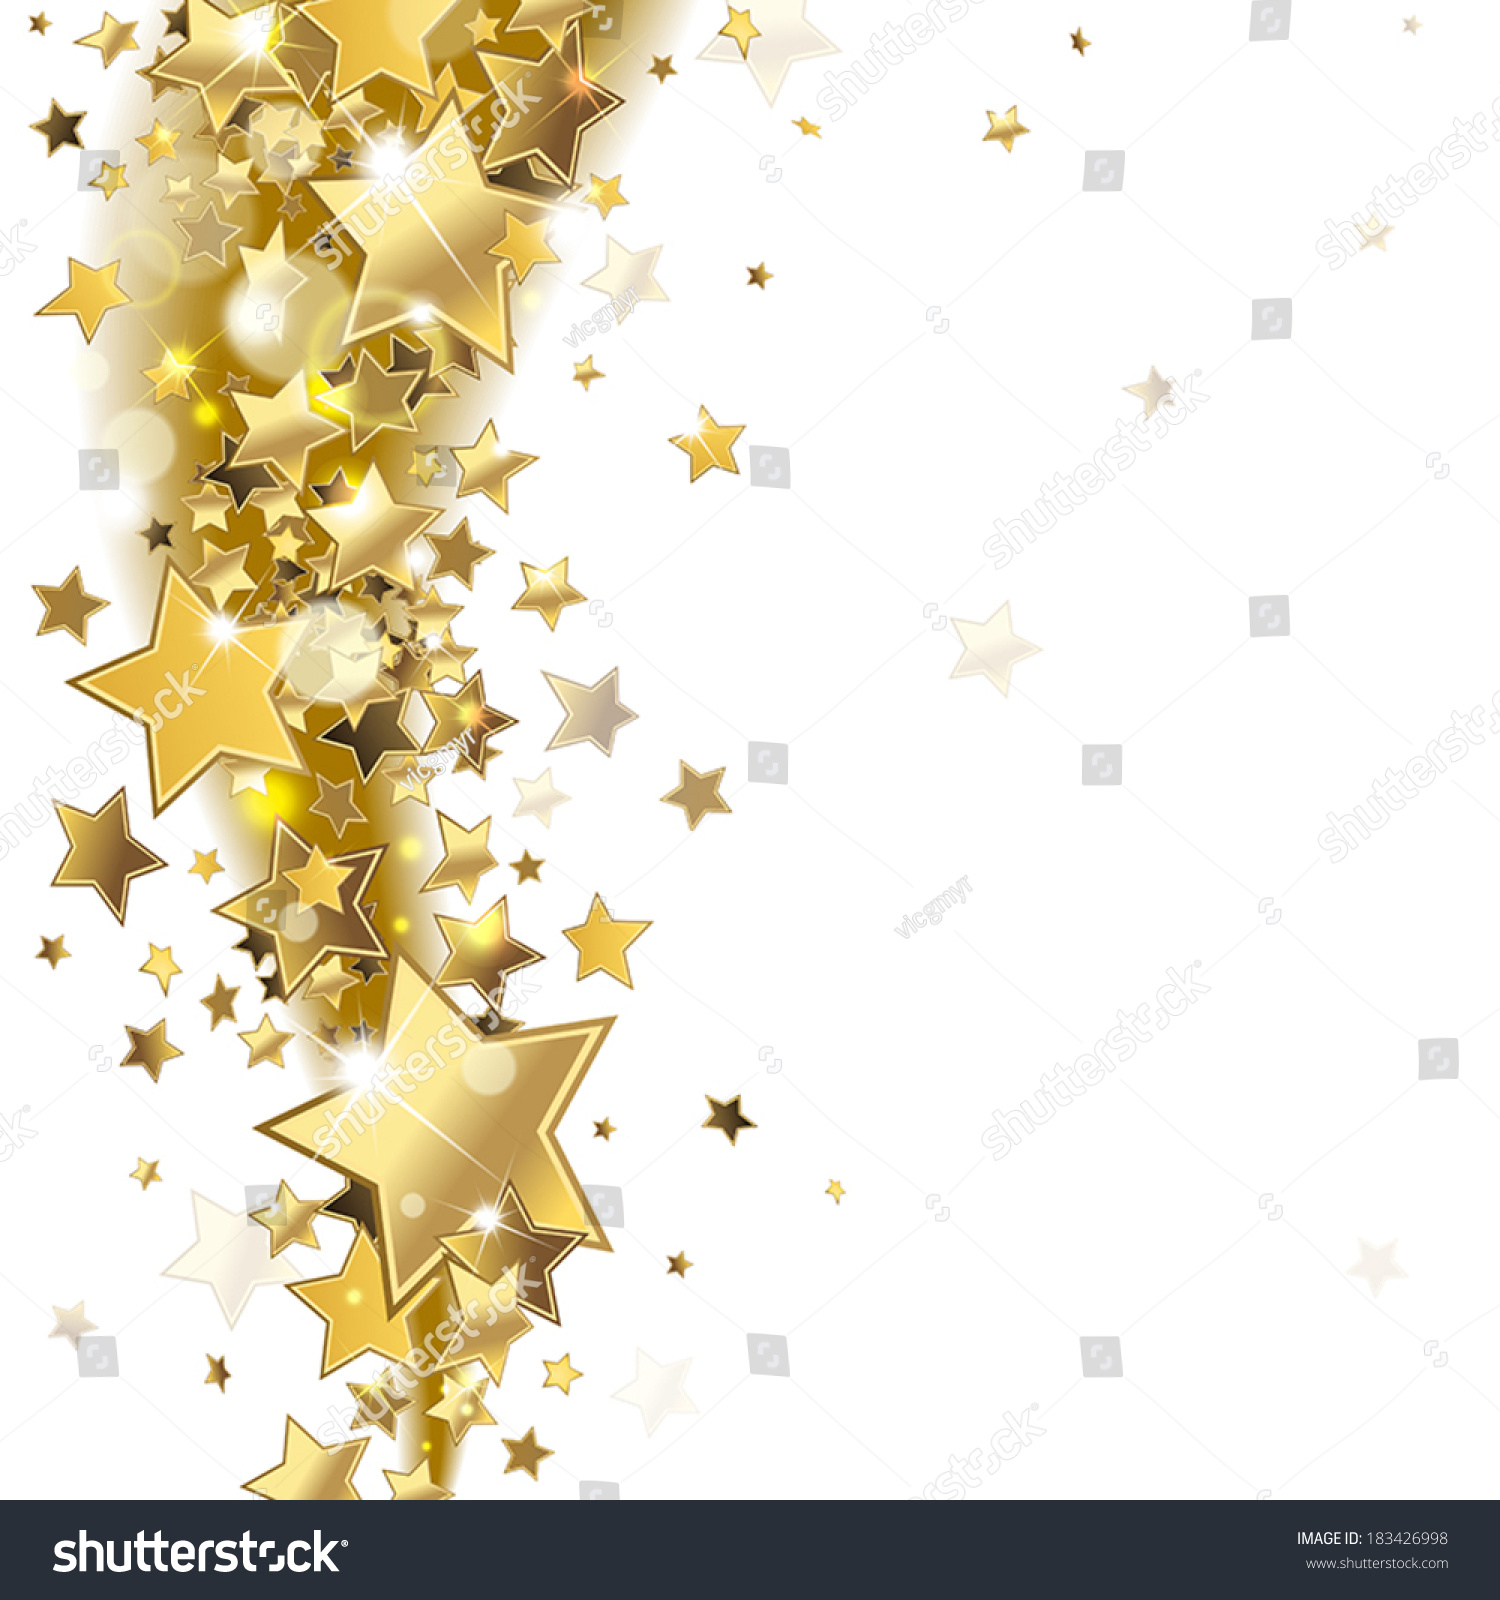 Background Shiny Gold Stars Stock Vector 183426998 Shutterstock